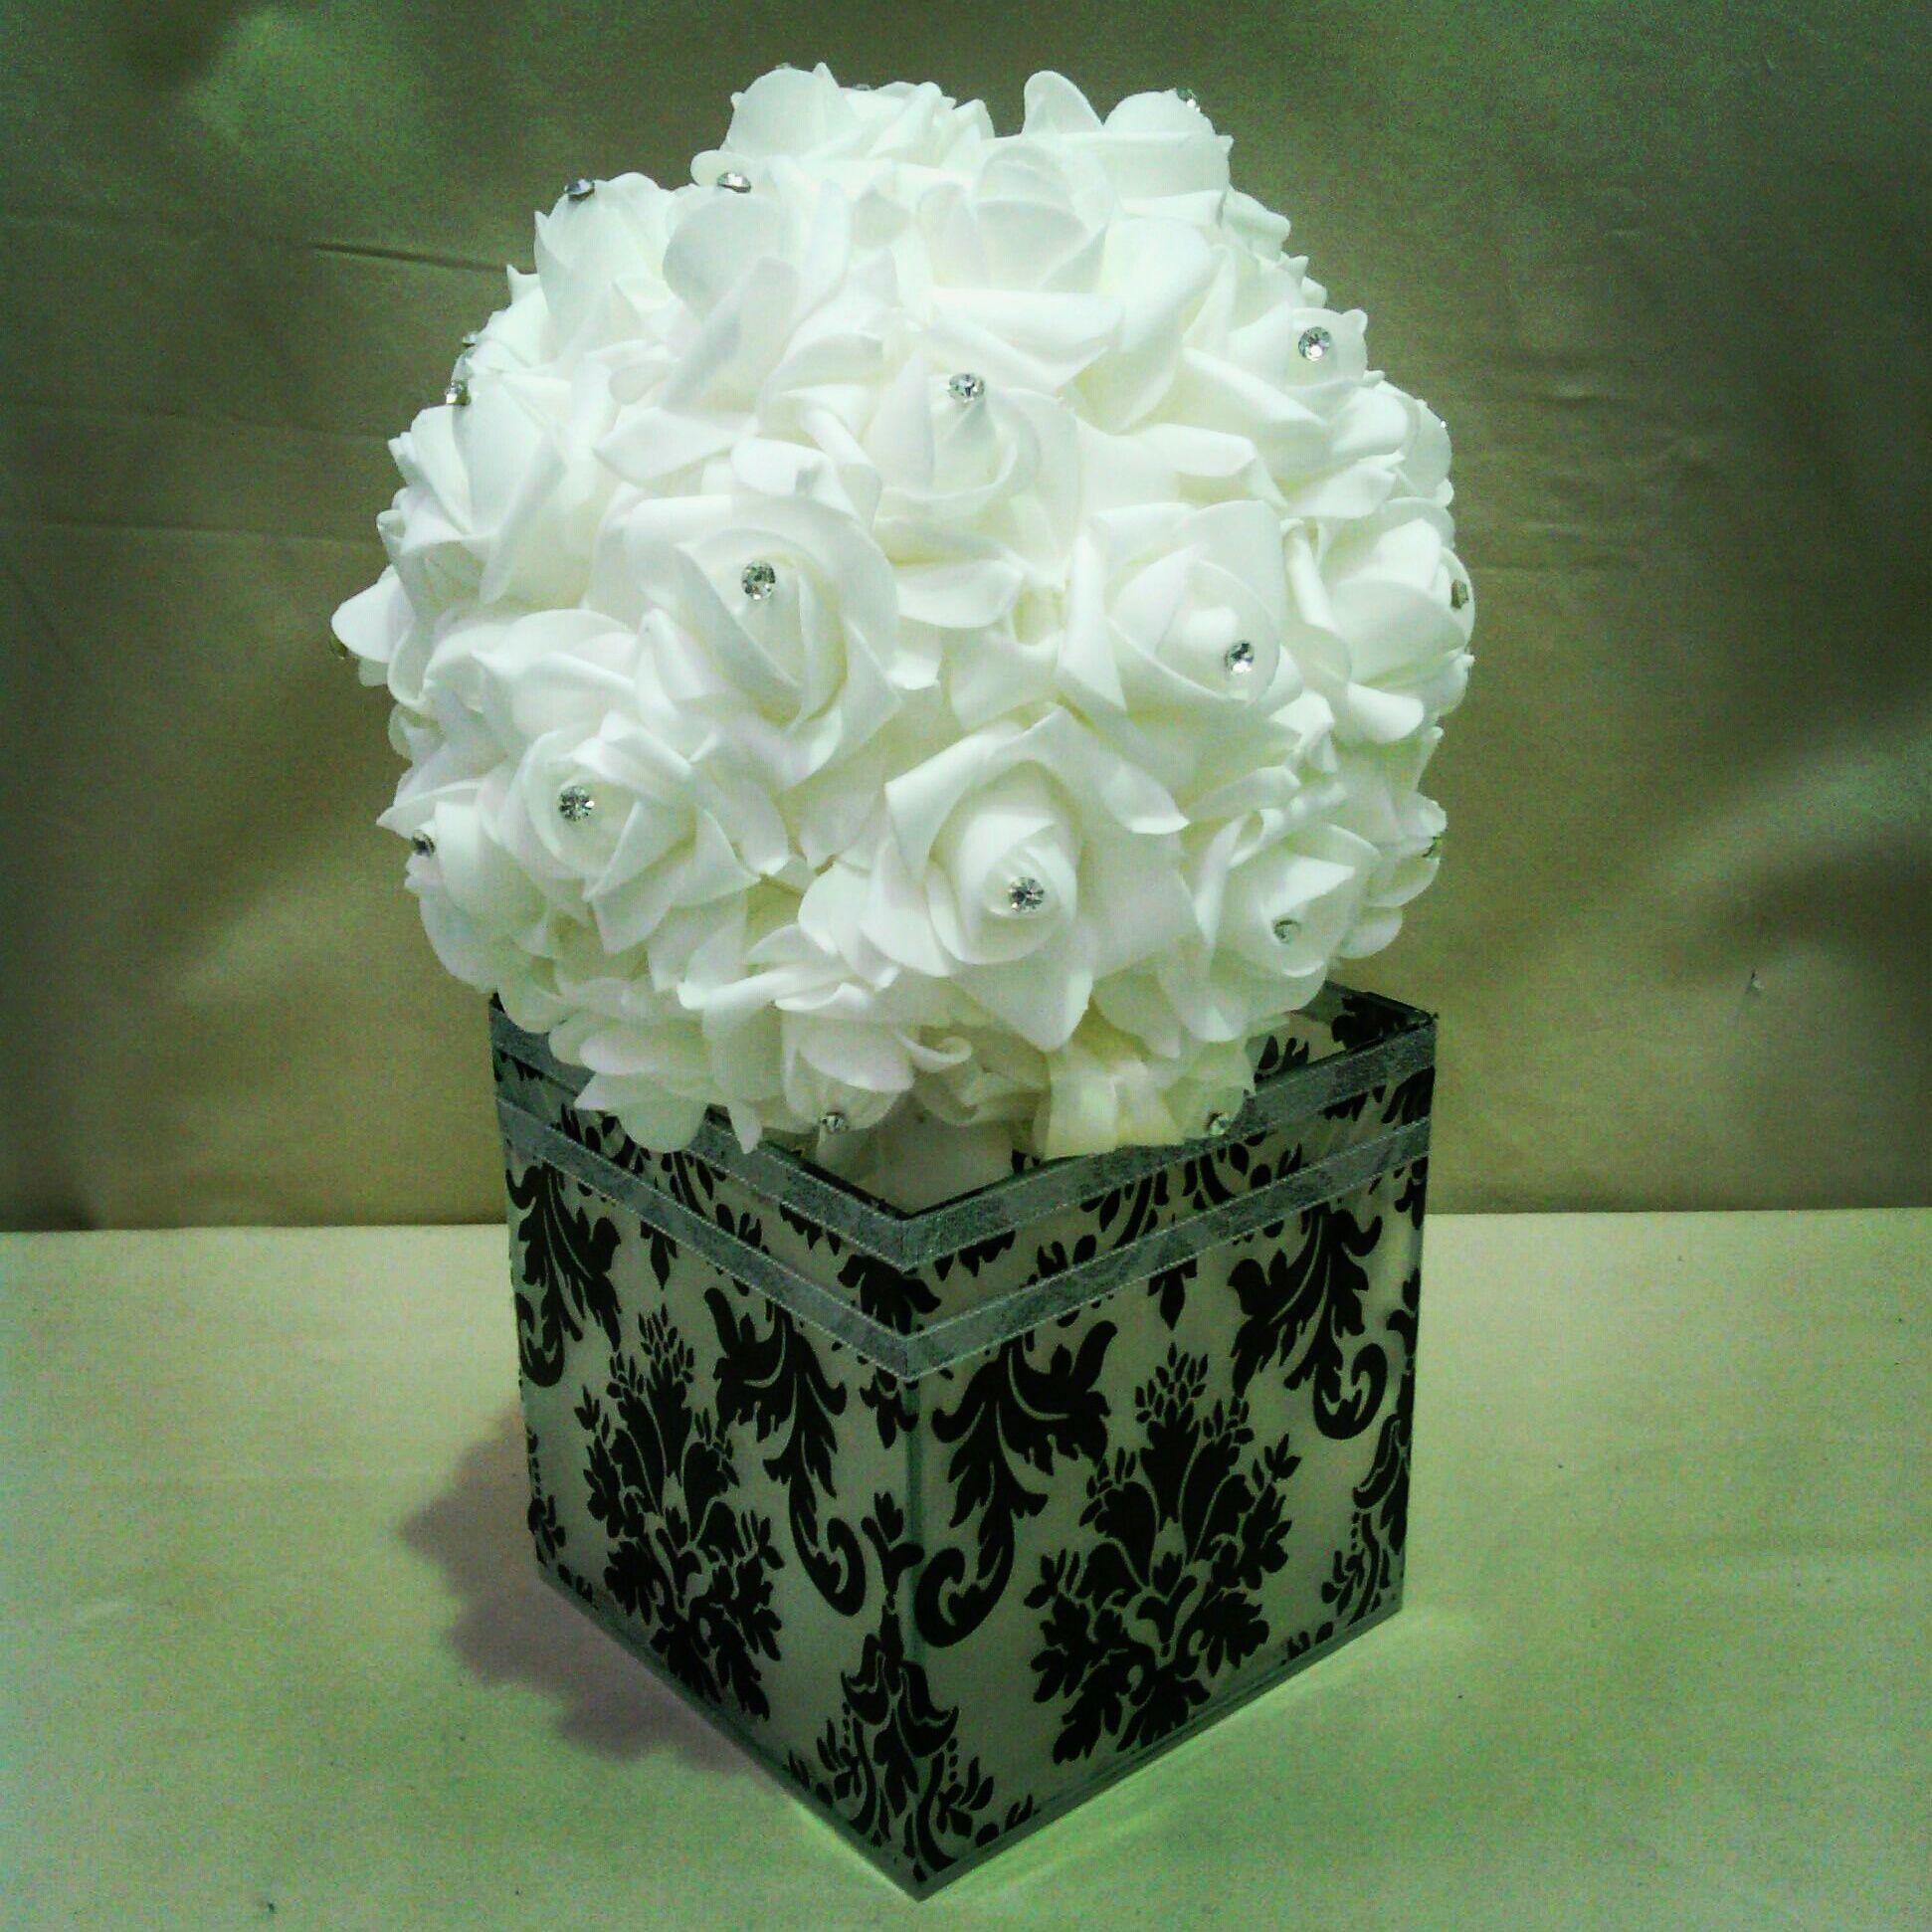 Rose ball on damask glass cube